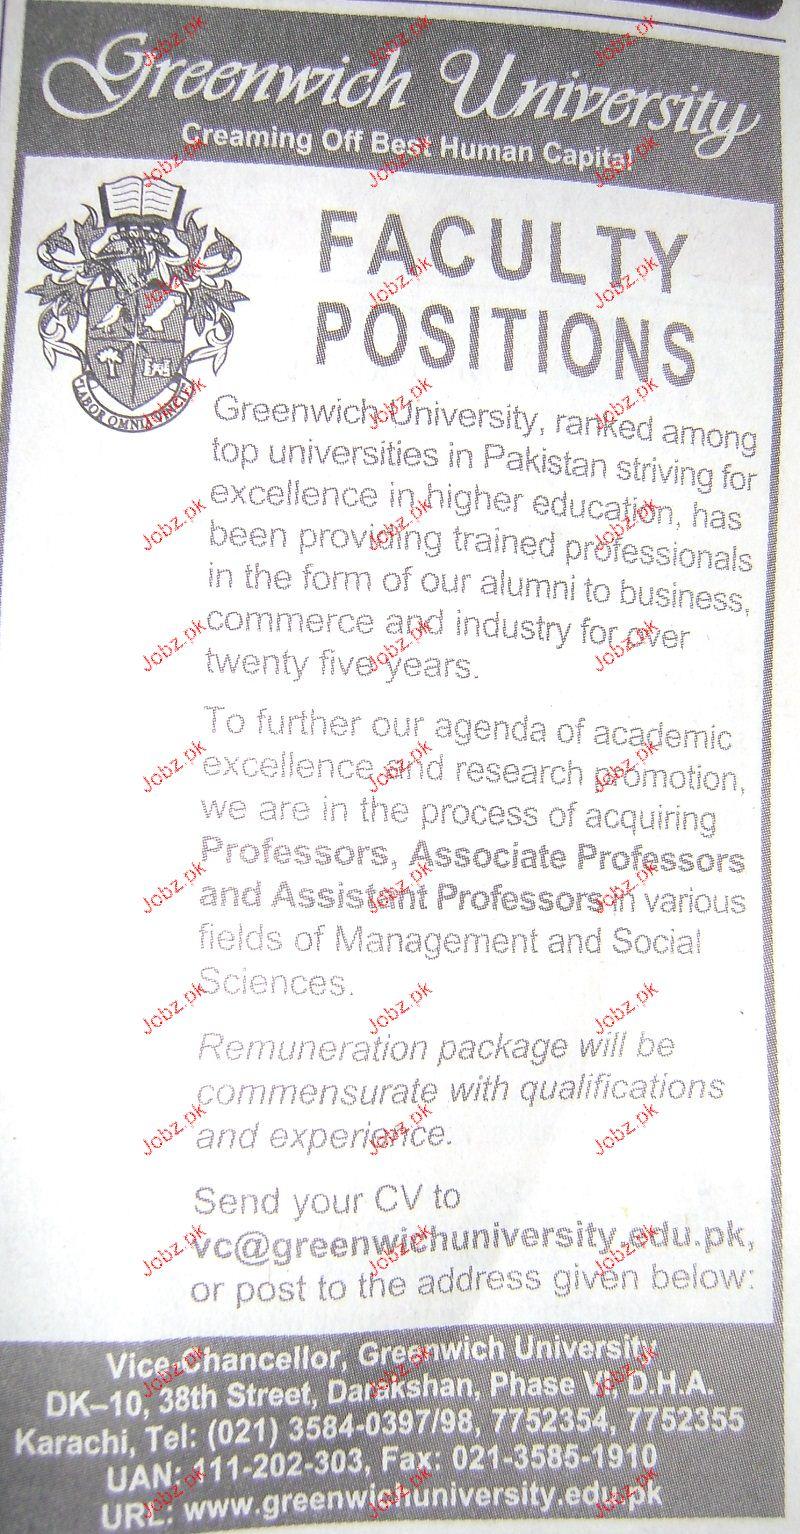 Assistant Professors Job Opportunity